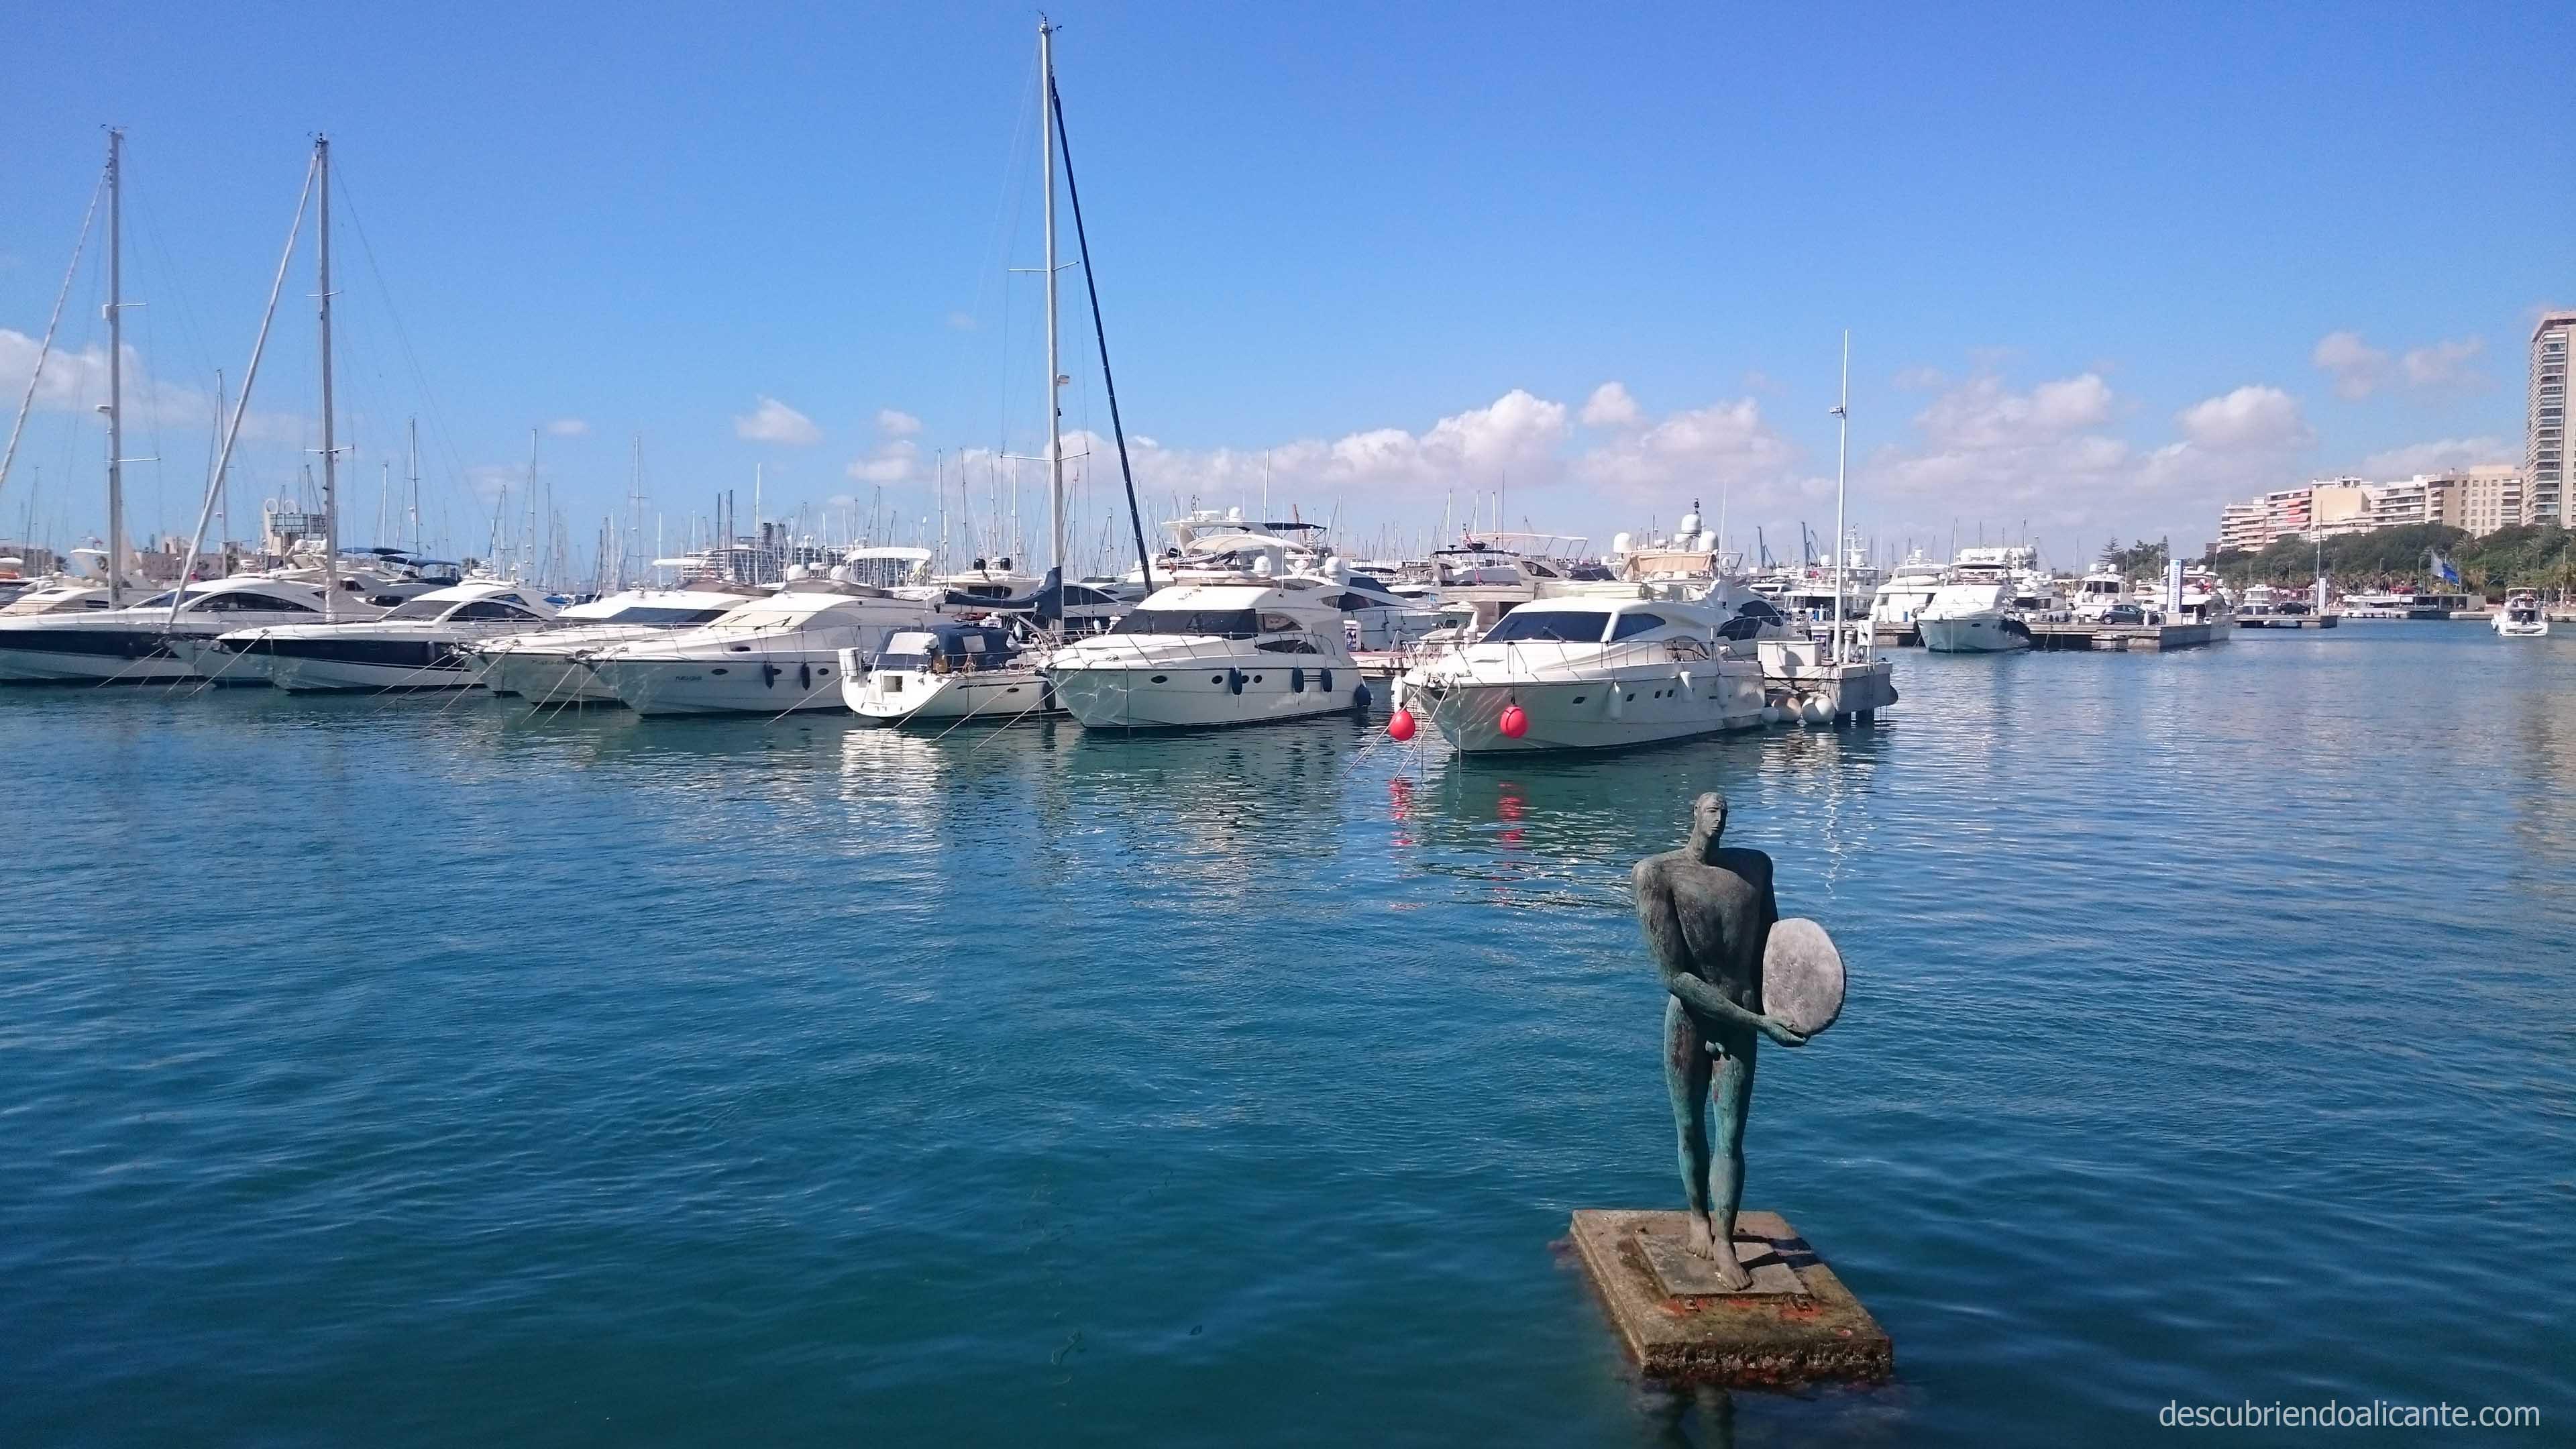 estatua-icaro-puerto-alicante